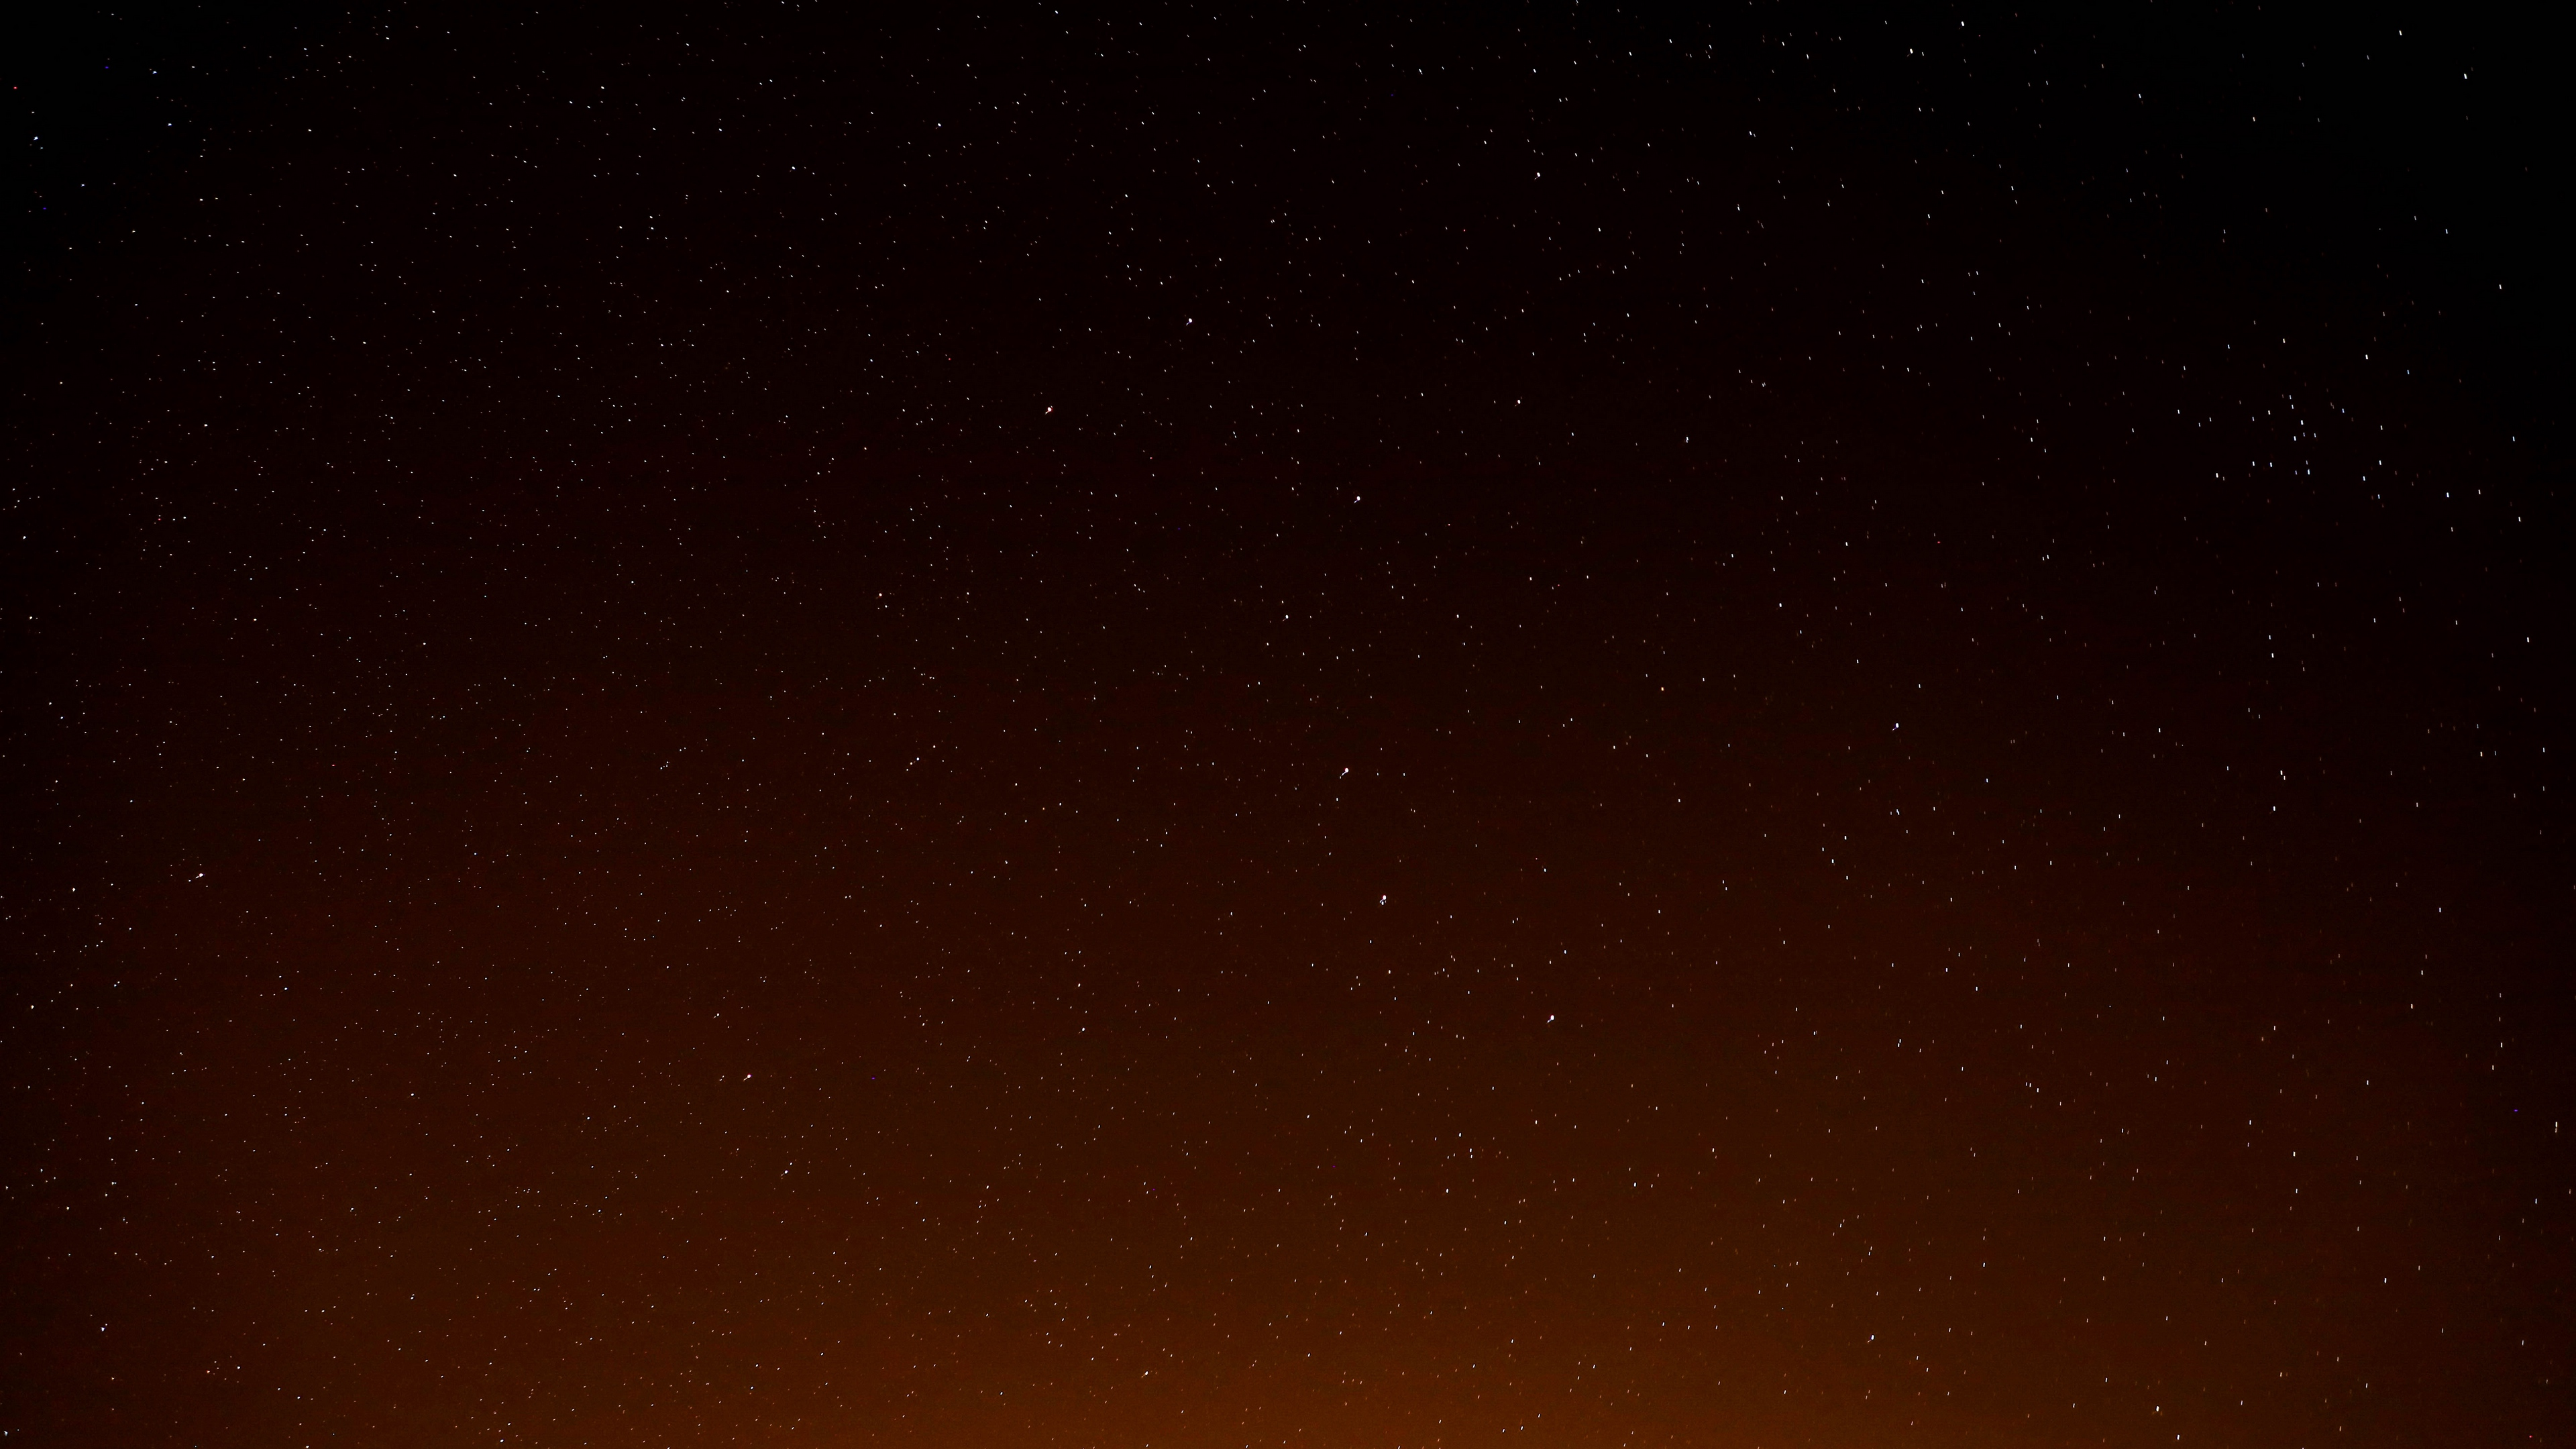 starry sky stars space 4k 1536013917 - starry sky, stars, space 4k - Stars, starry sky, Space